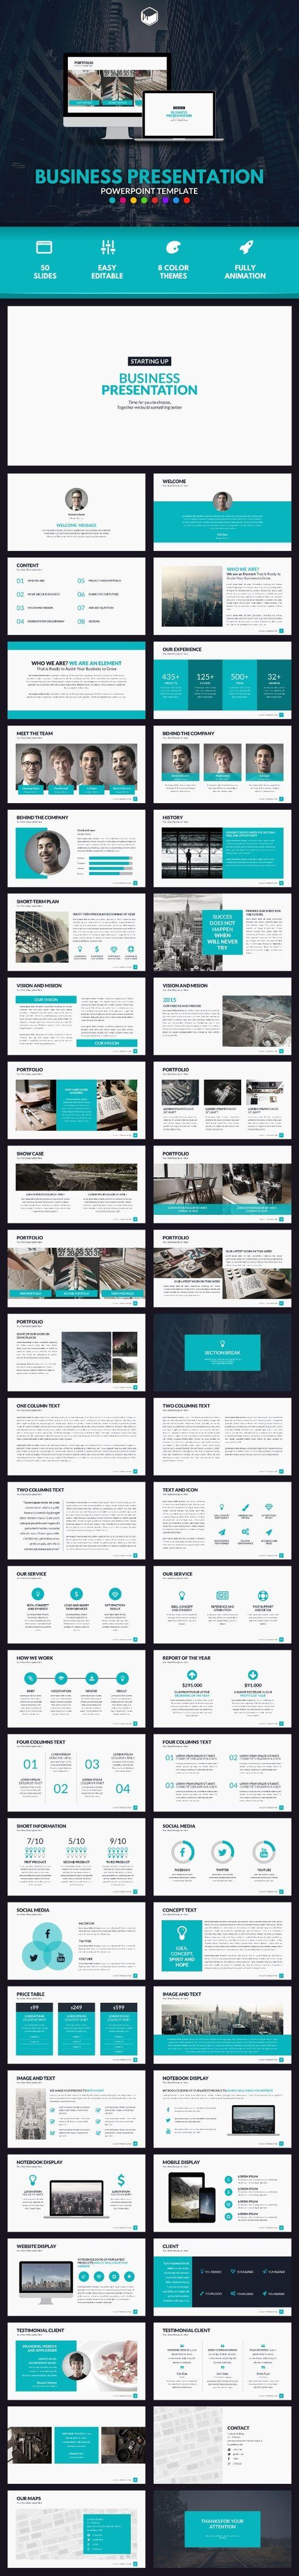 Business Presentation - PowerPoint Template #design #slides Download: http://graphicriver.net/item/business-presentation-powerpoint-template/12574621?ref=ksioks